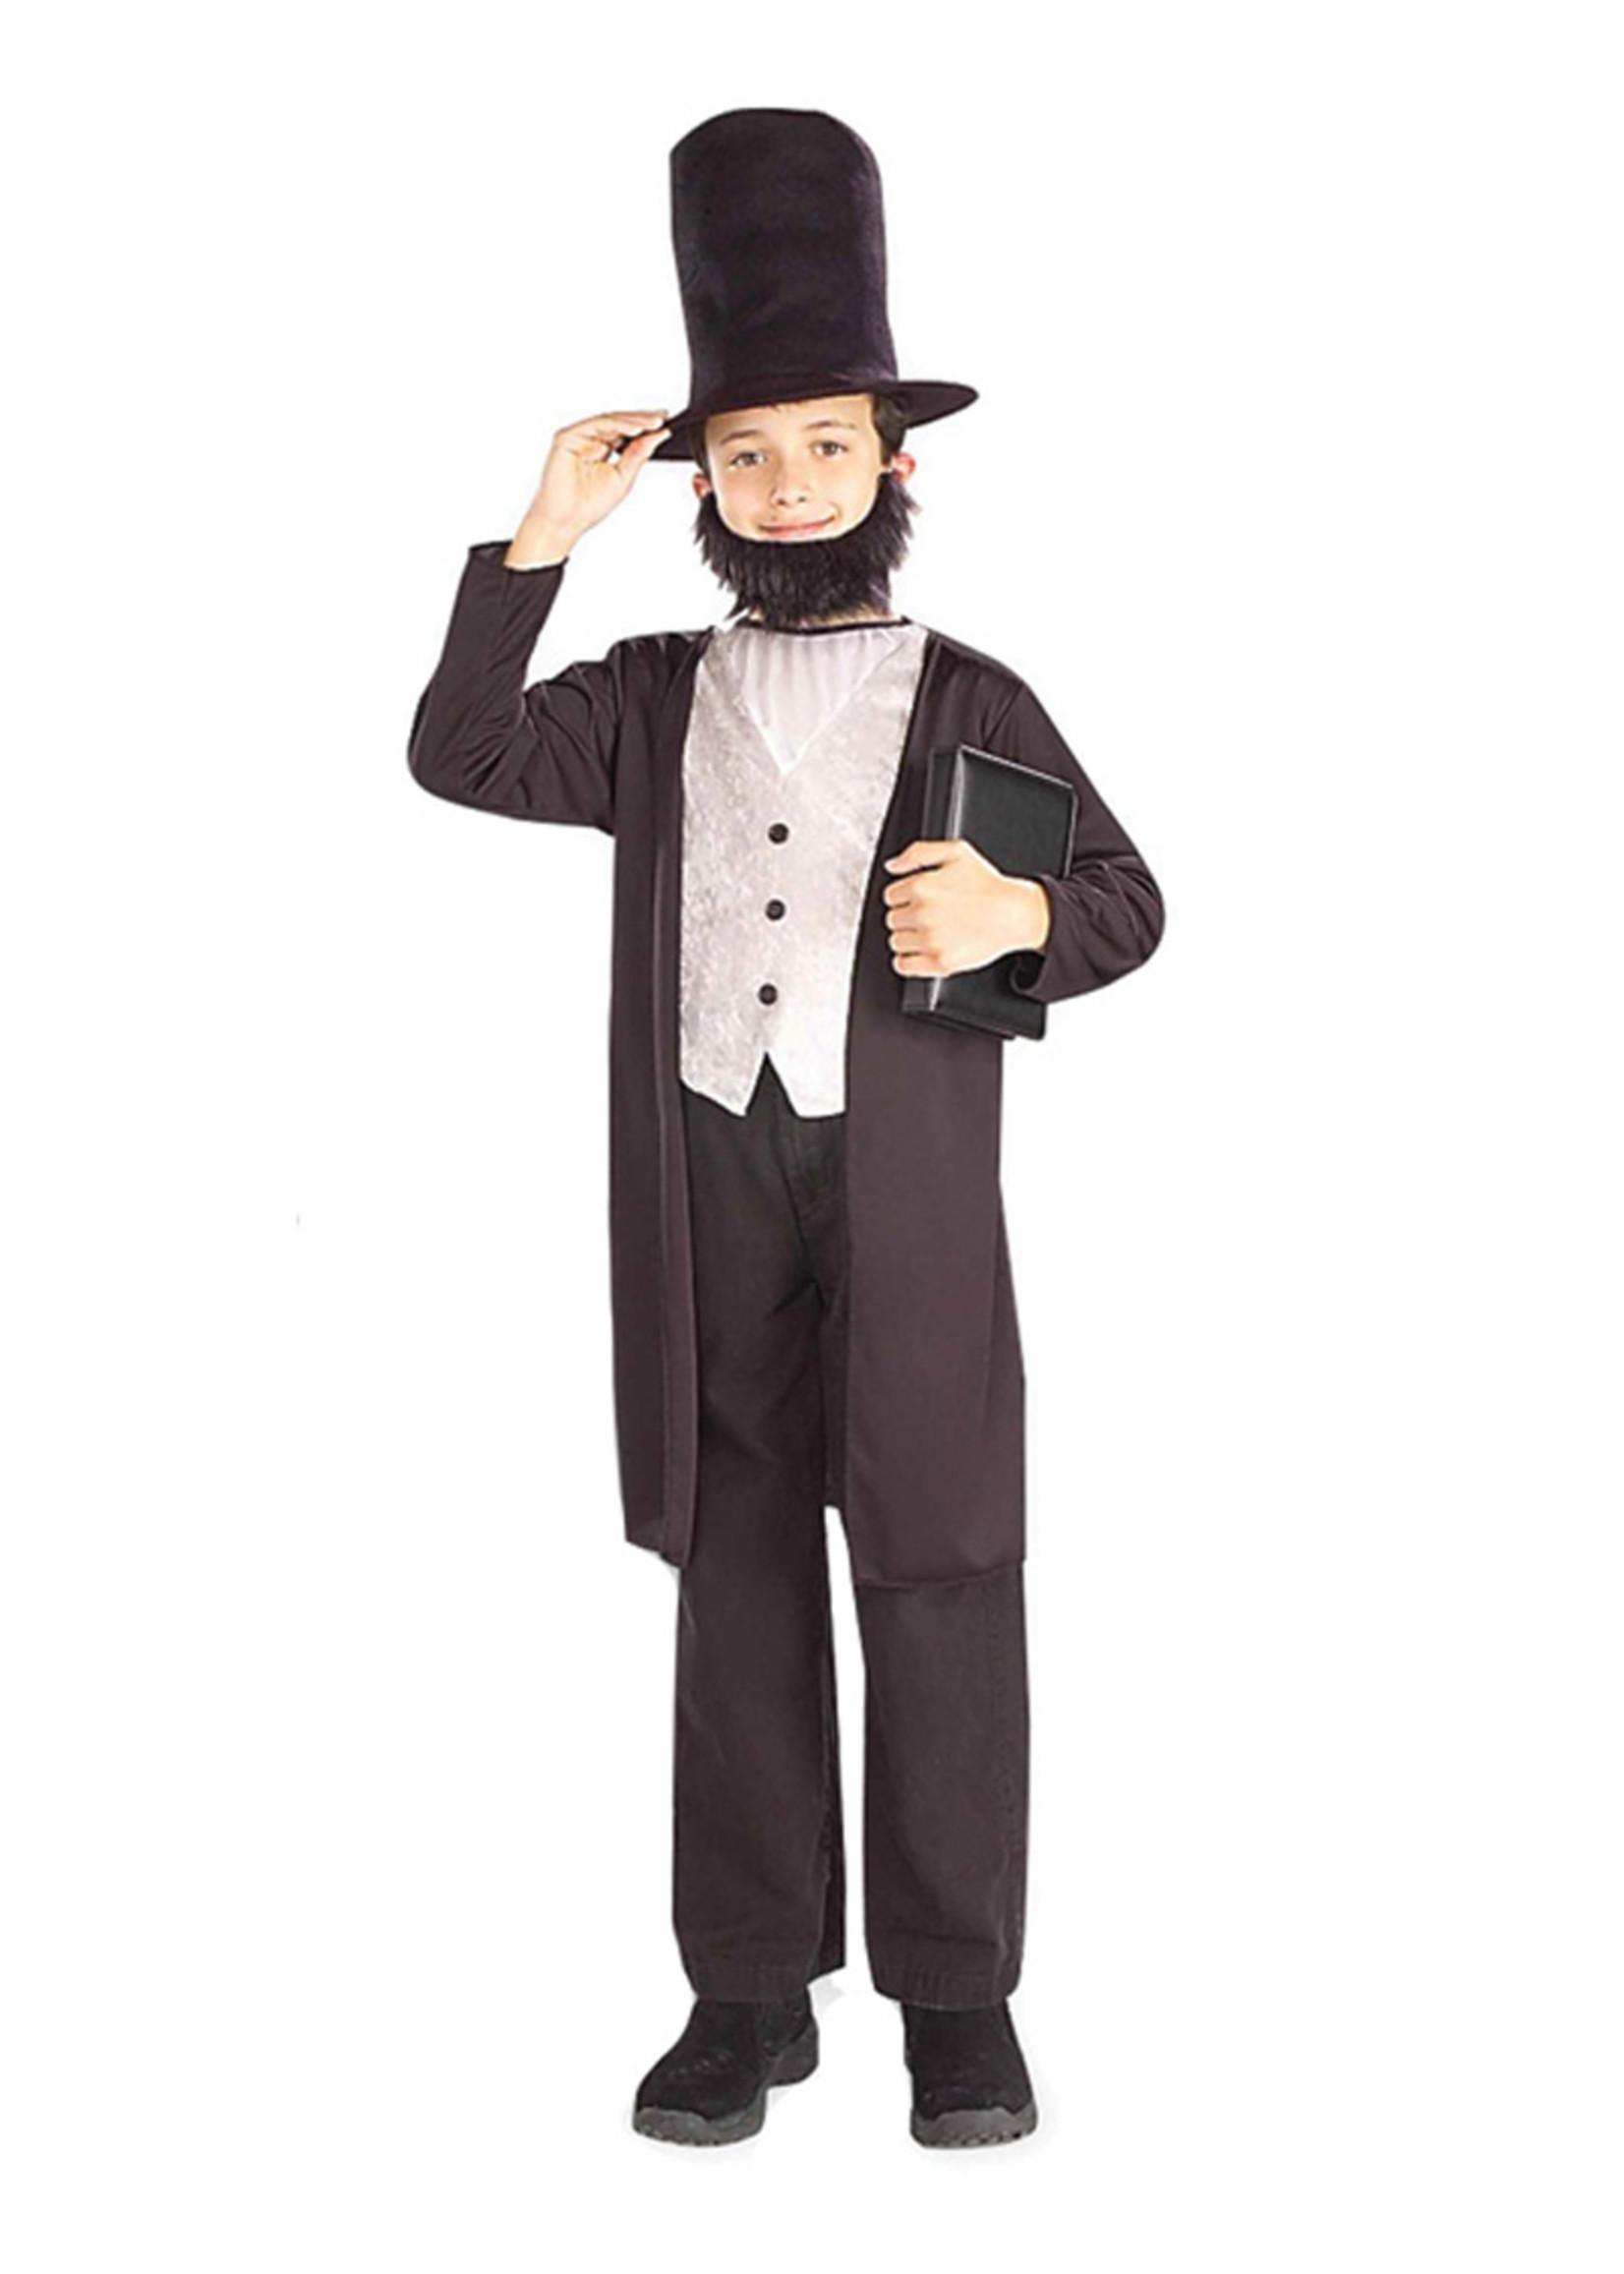 Abraham Lincoln Costume - Boy's